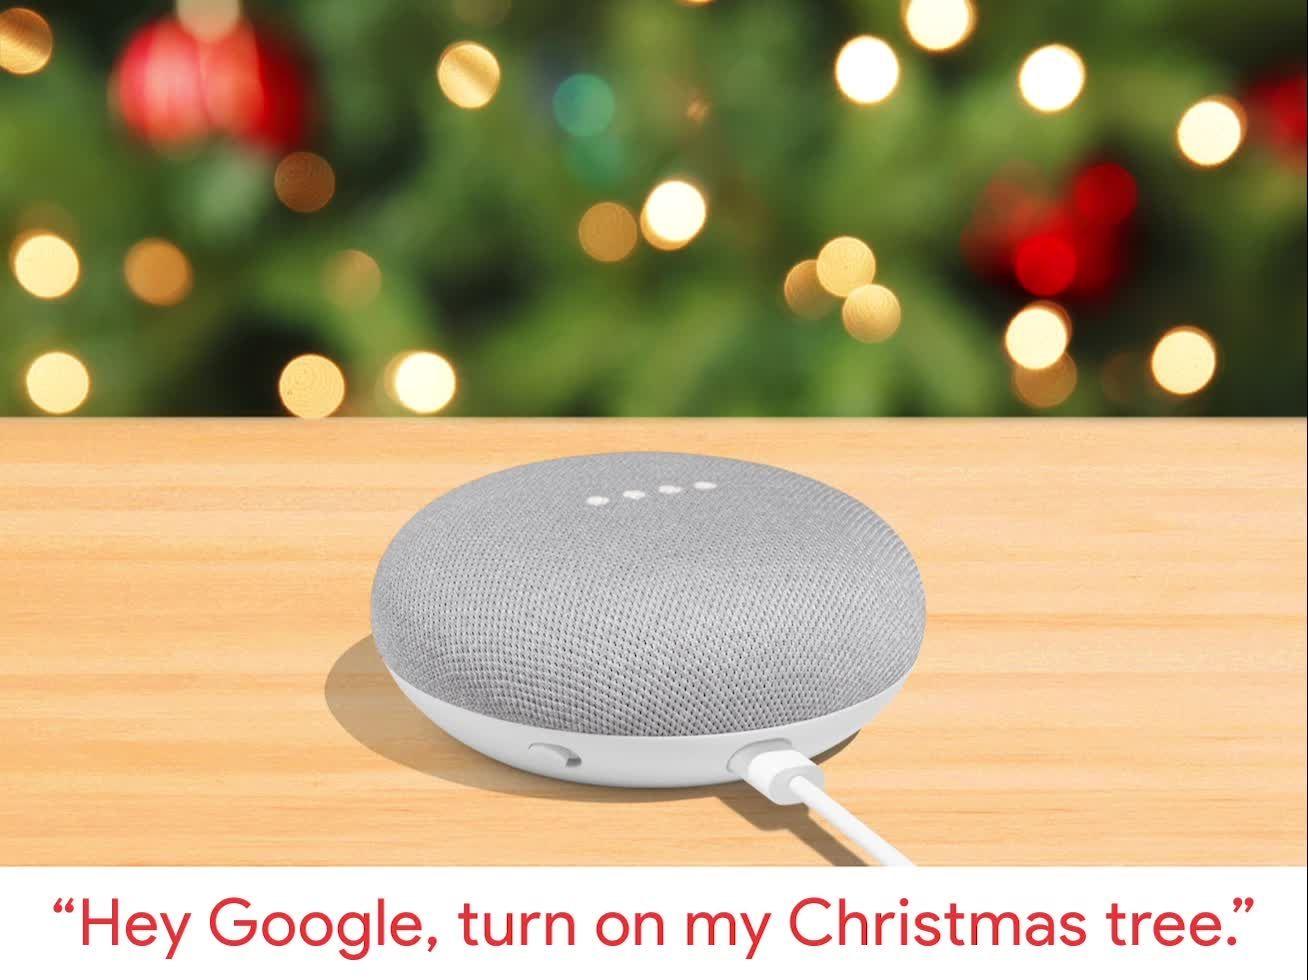 Hey Google, turn on my Christmas tree